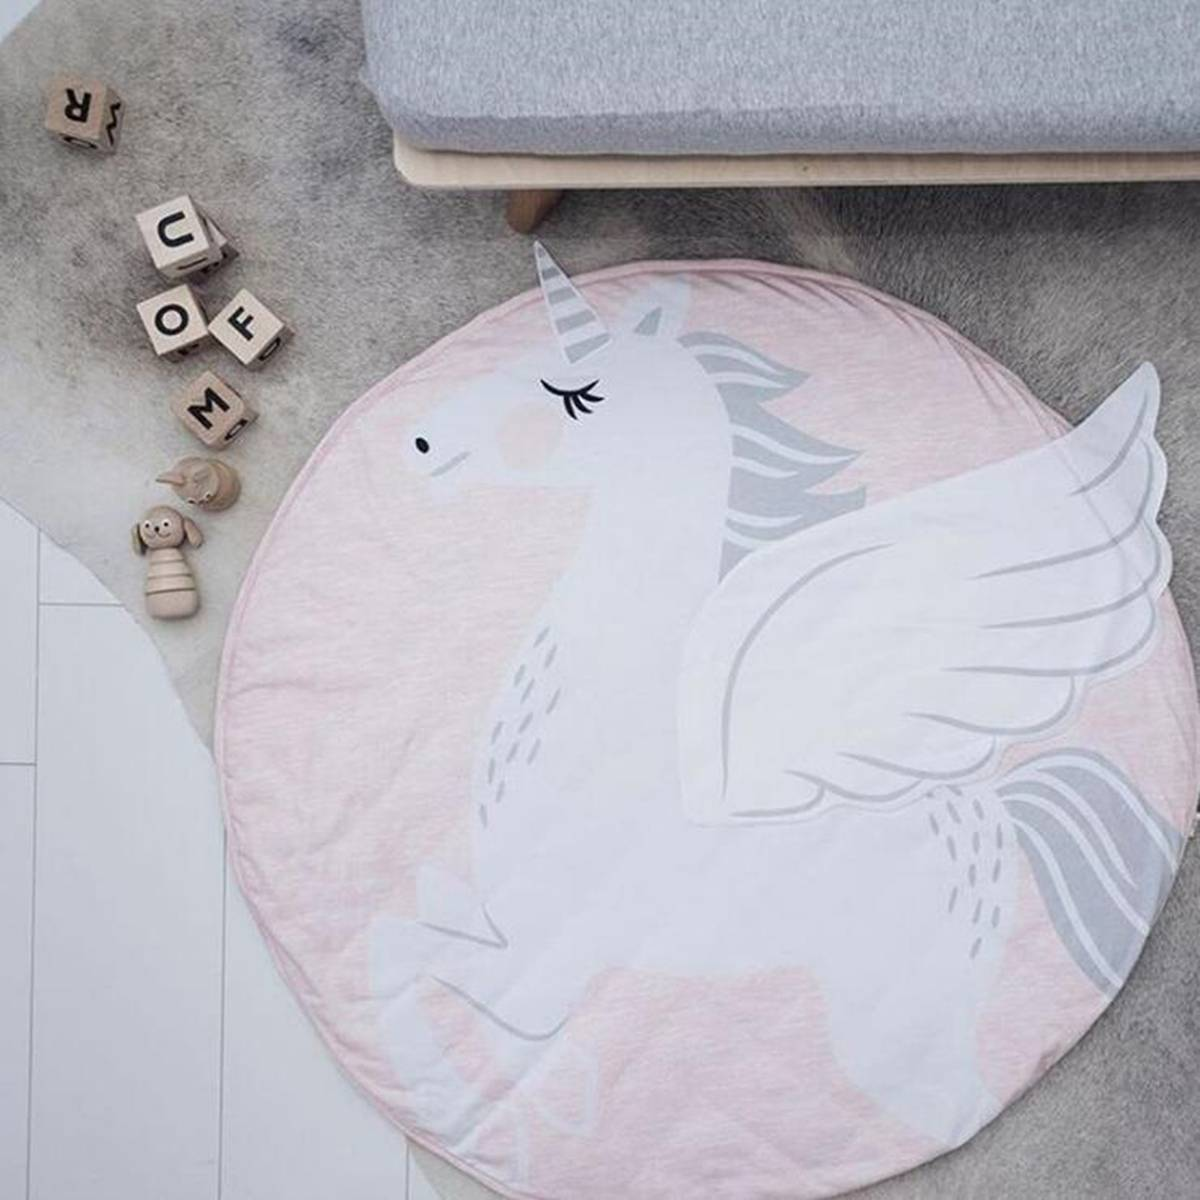 Baby Cartoon Lovely Animal Pattern Play Mats Crawling Blanket Kids Game Play Mat Padded Carpet Floor Rug Nordic Style 95x95cm